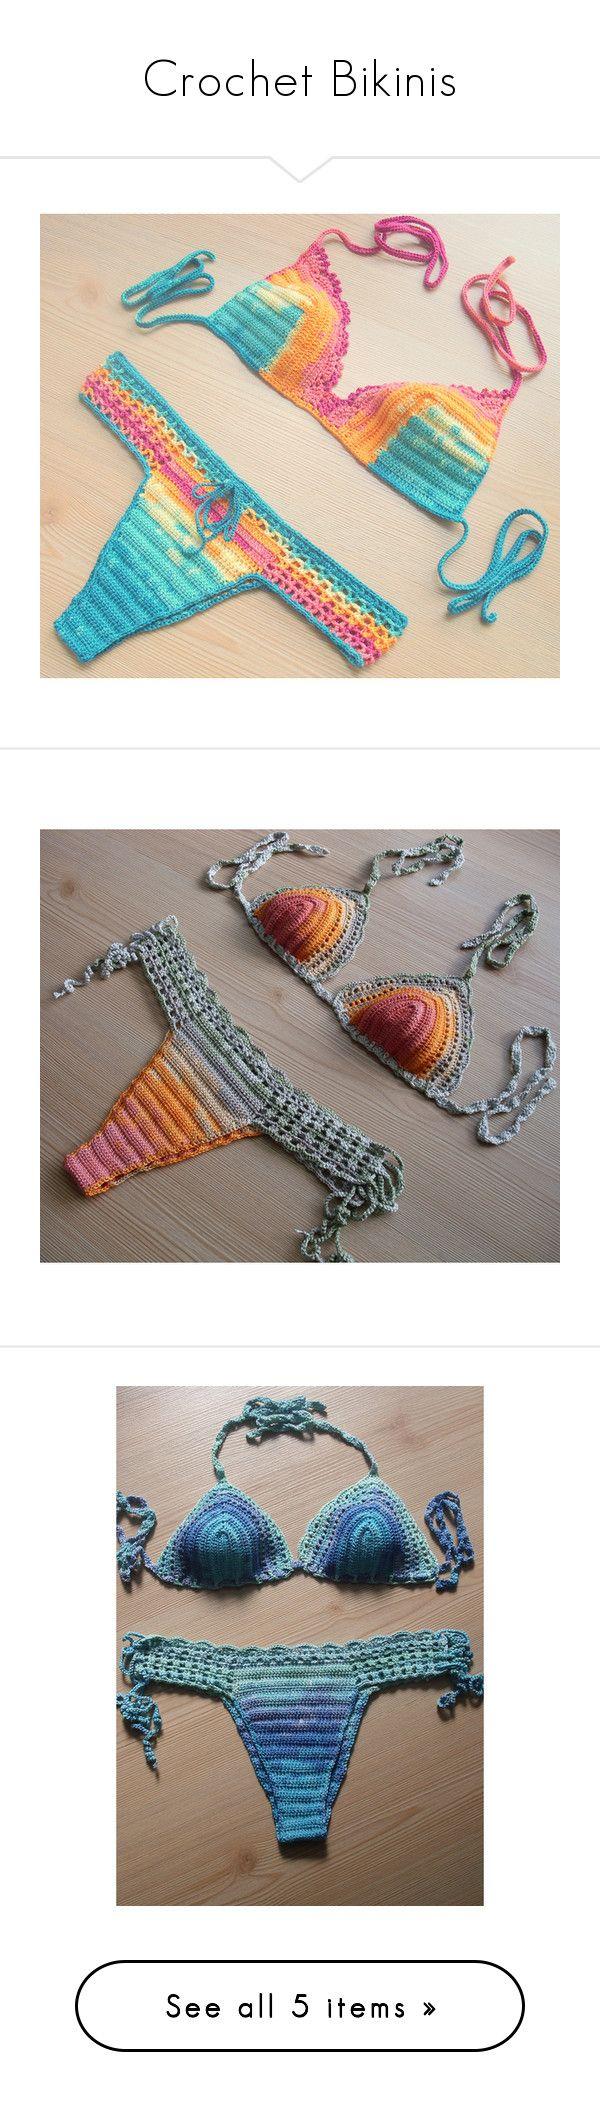 Seed bead ring ideas 5 nationtrendz com -  Crochet Bikinis By Fatma Erkal On Polyvore Featuring Swimwear Bikinis Silver